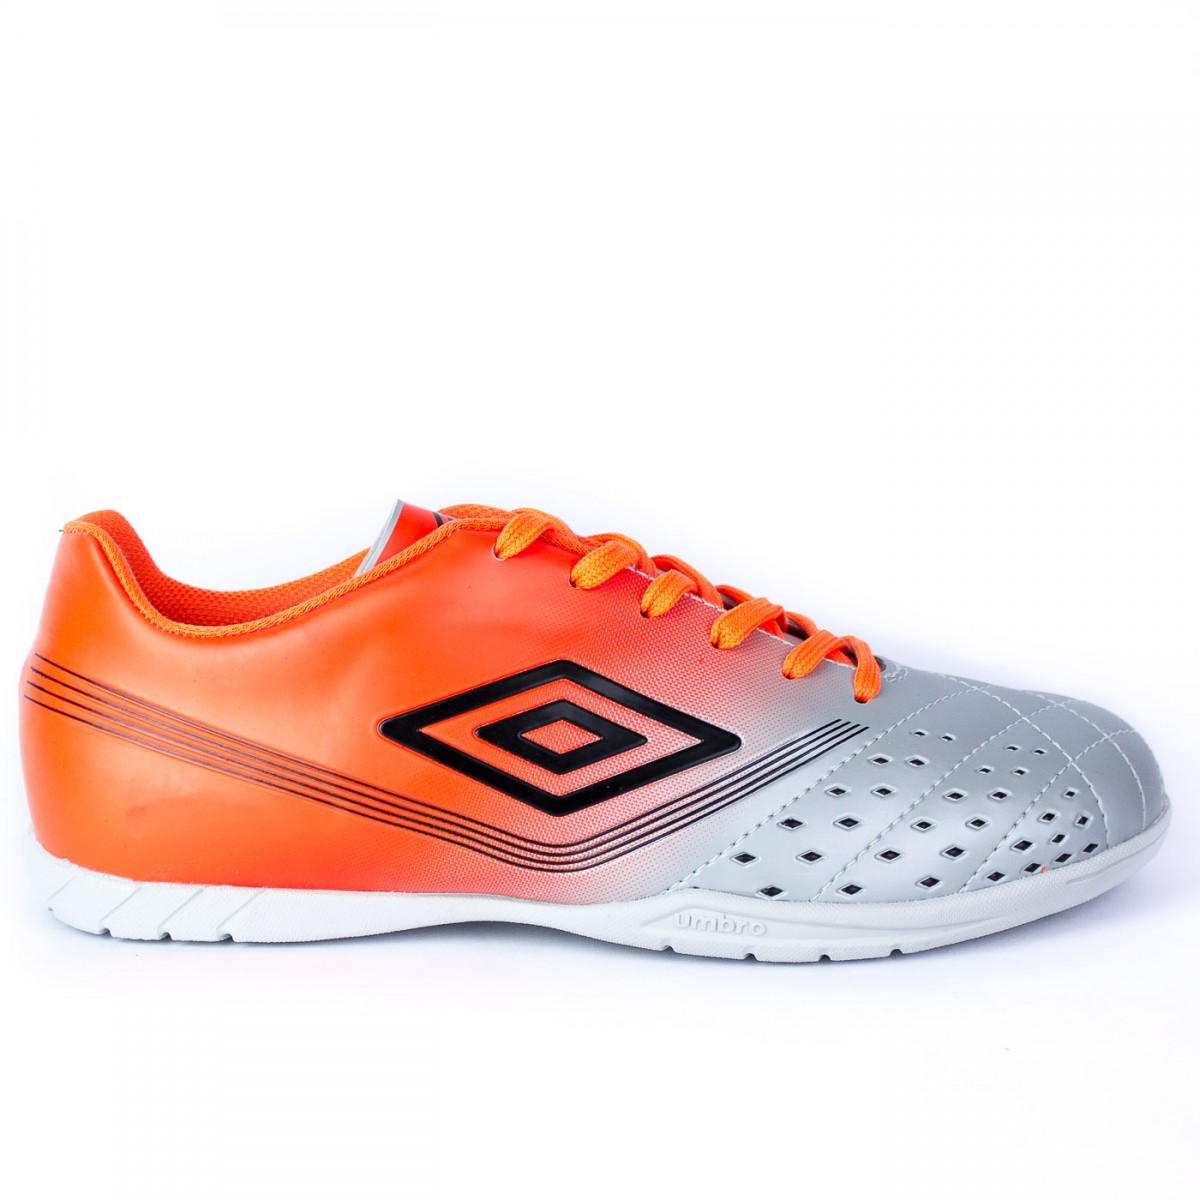 17f12a4b63 Bizz Store - Chuteira Futsal Umbro Fifty Indoor Laranja Cinza